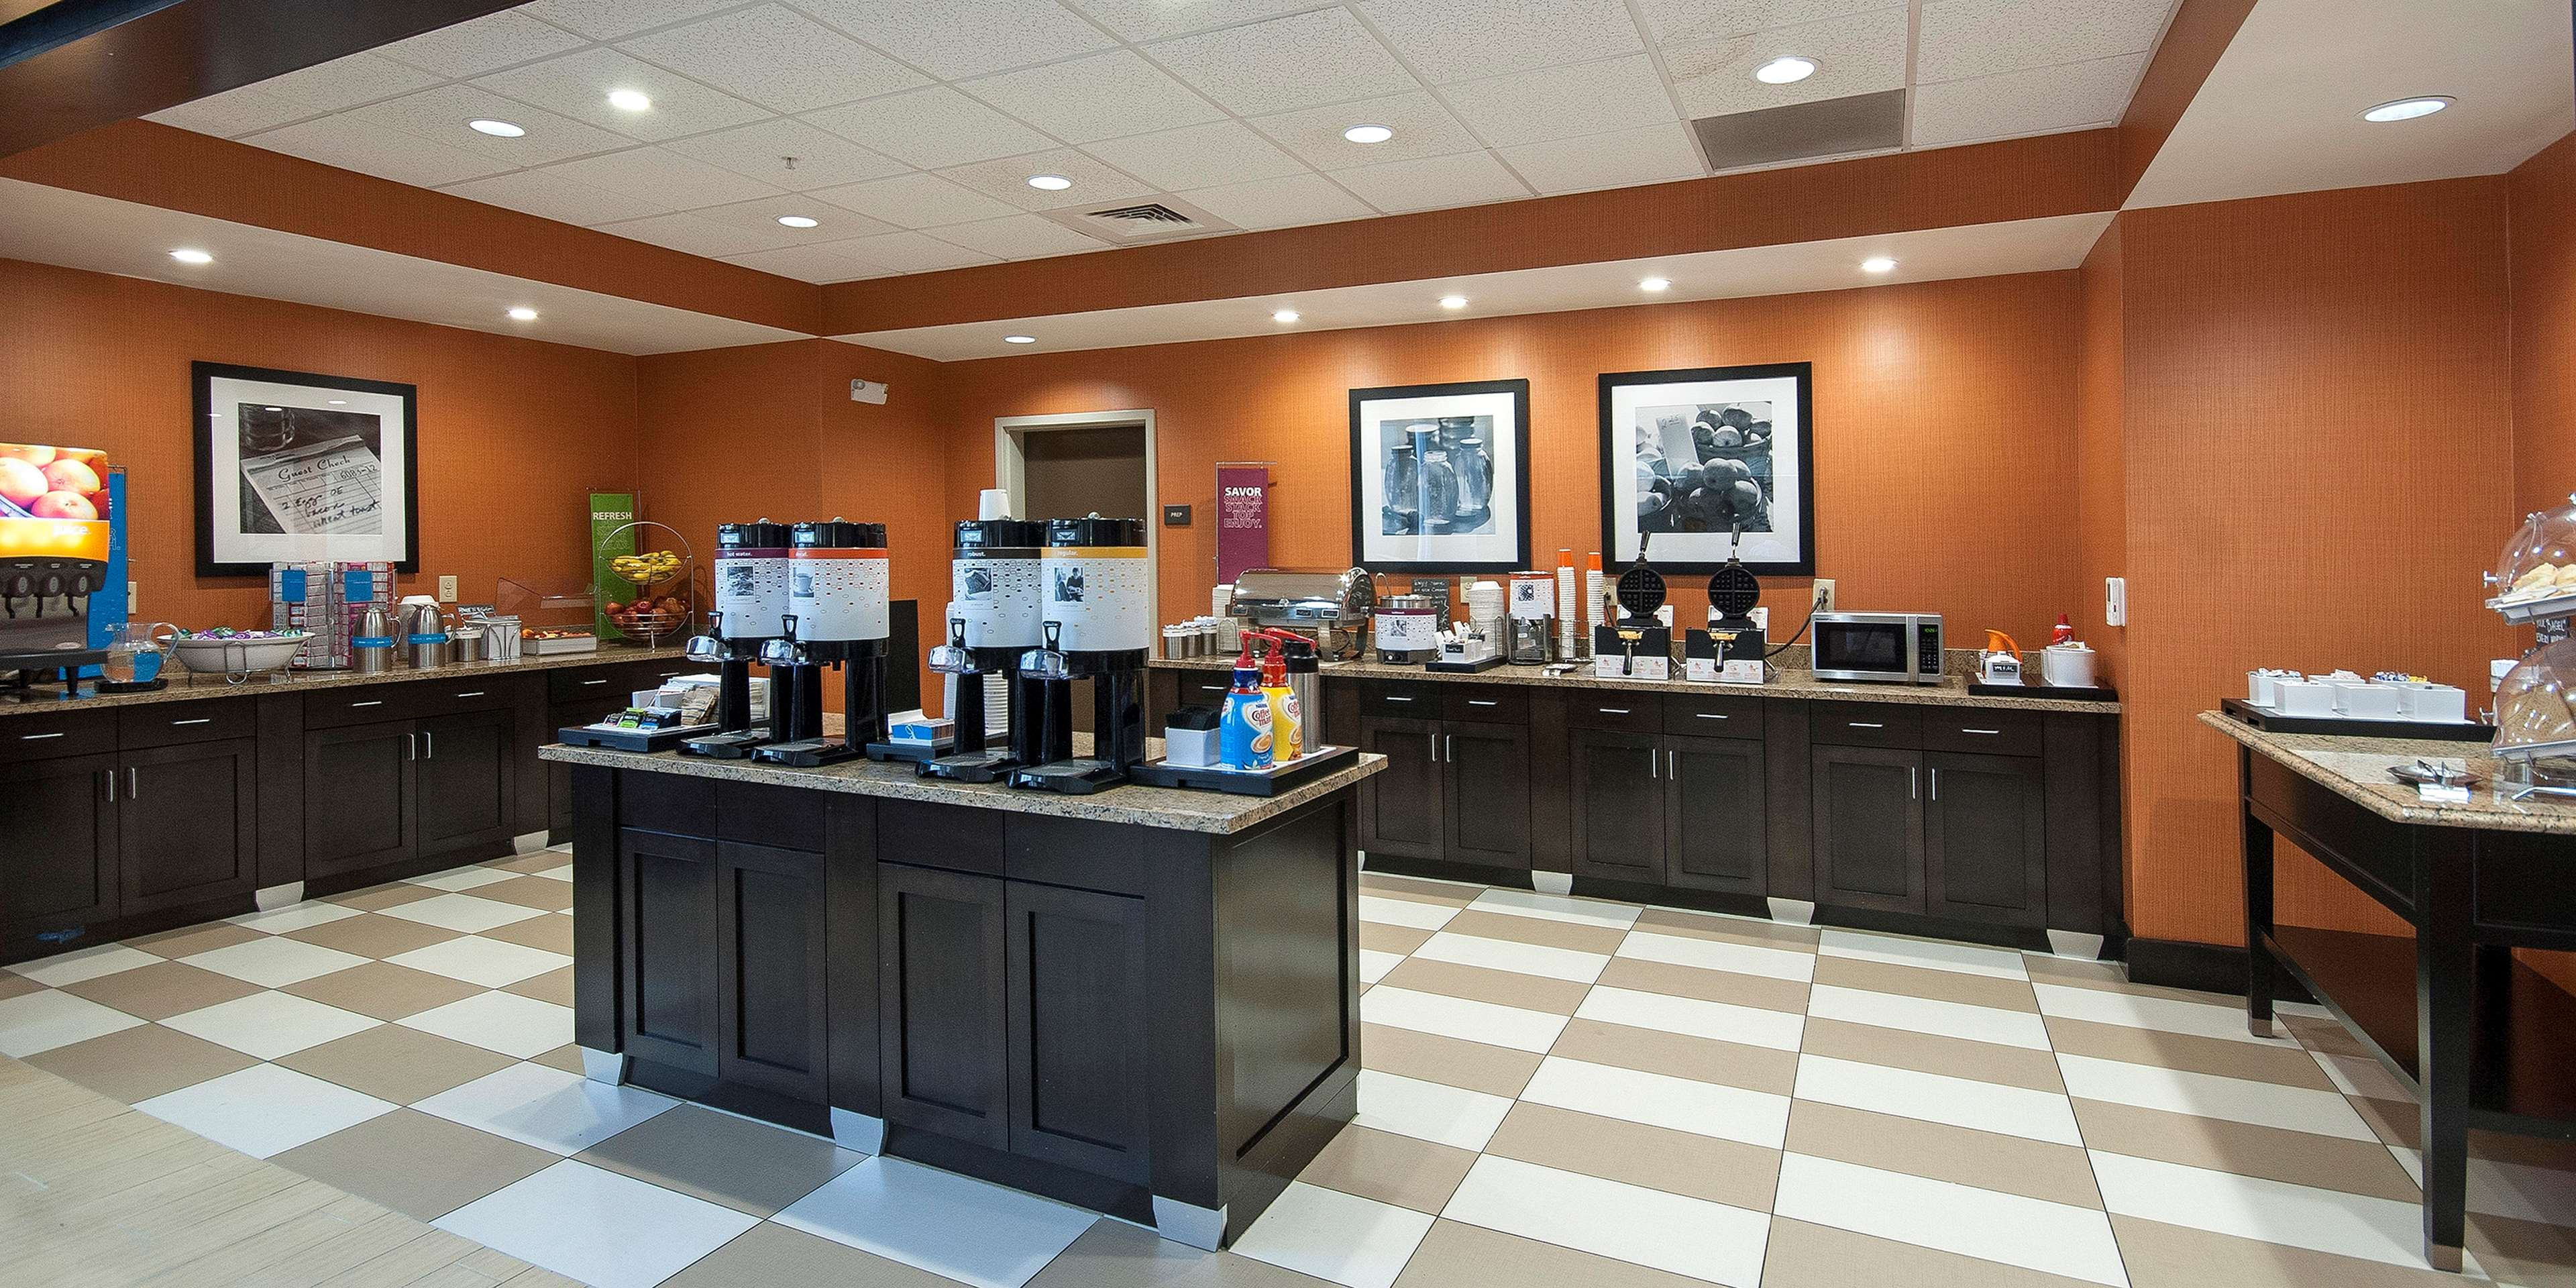 Hampton Inn & Suites Seneca-Clemson Area image 34